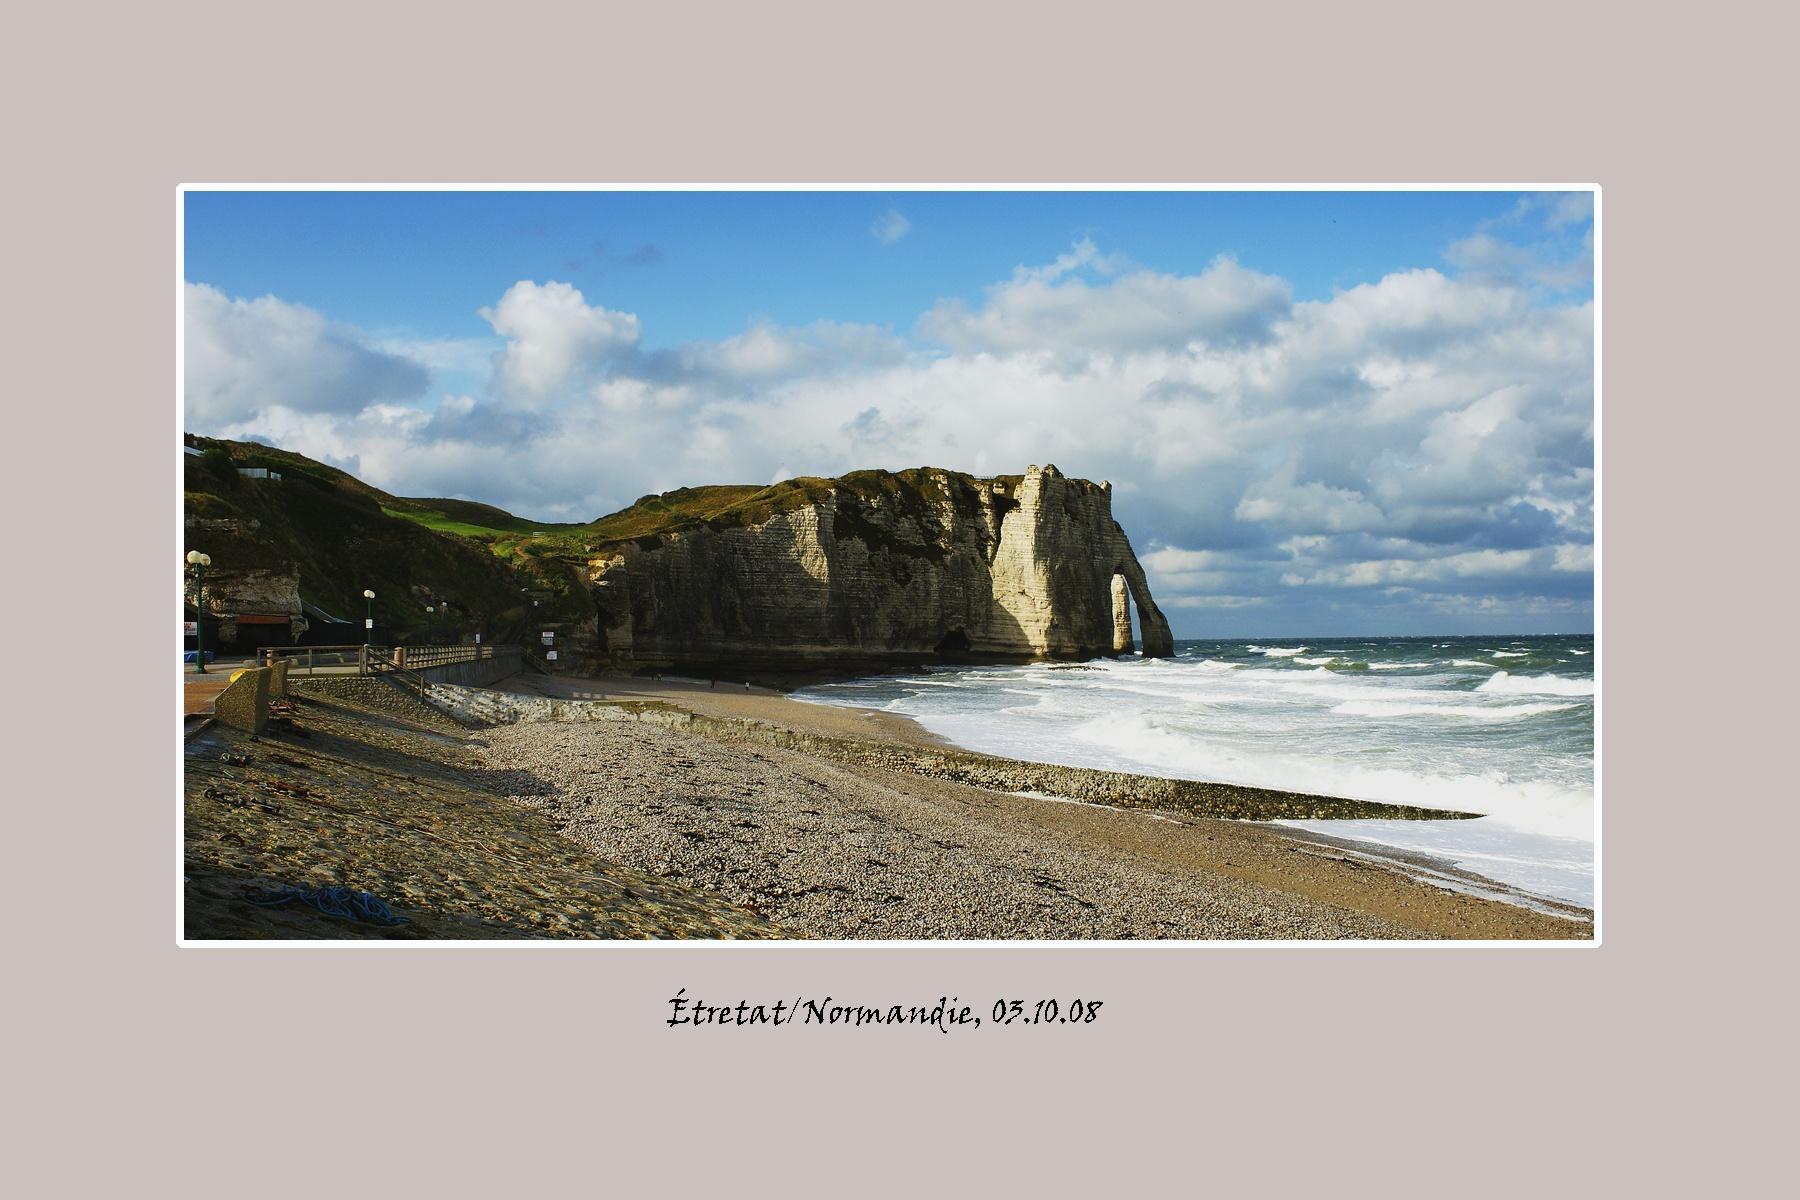 Etretatelephantrock_Normandie.jpg